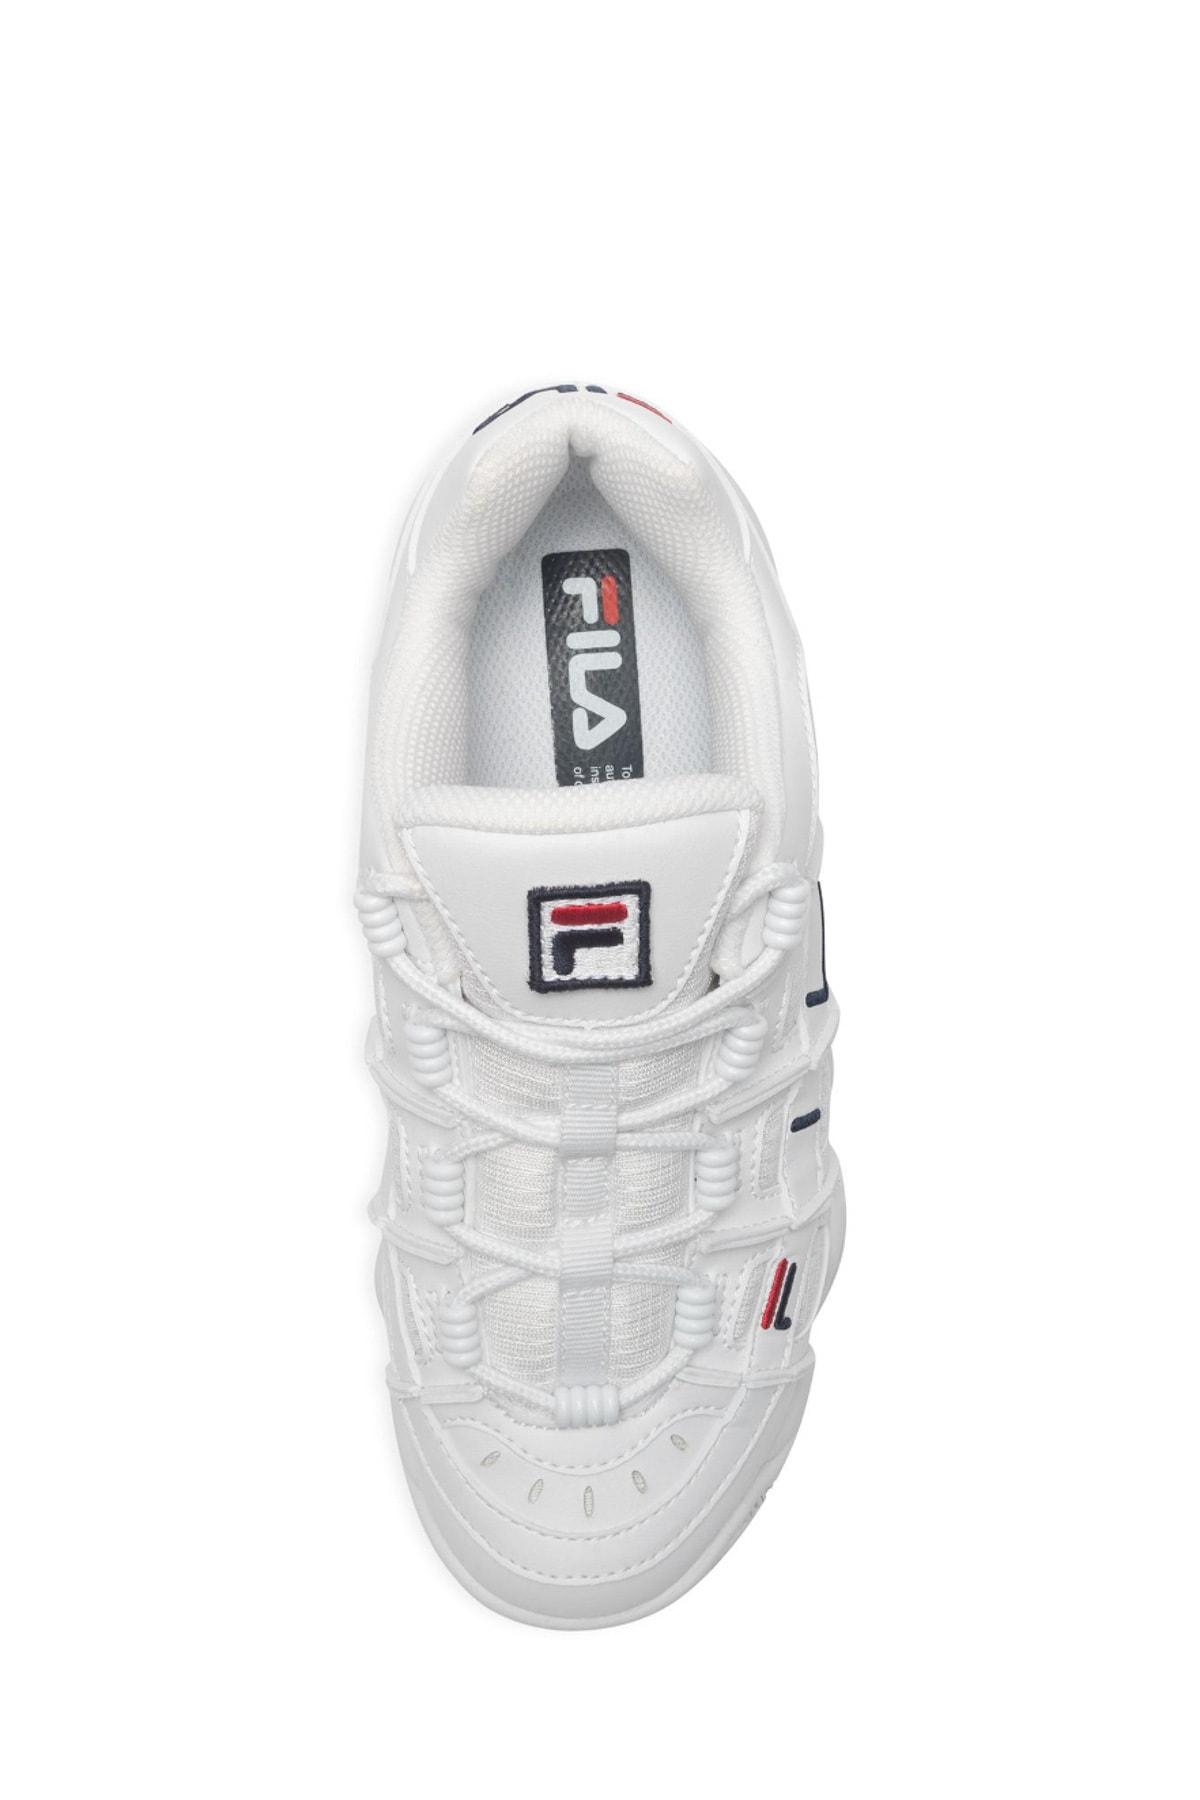 Fila Kadın Sneaker - 1010855_1FG 2